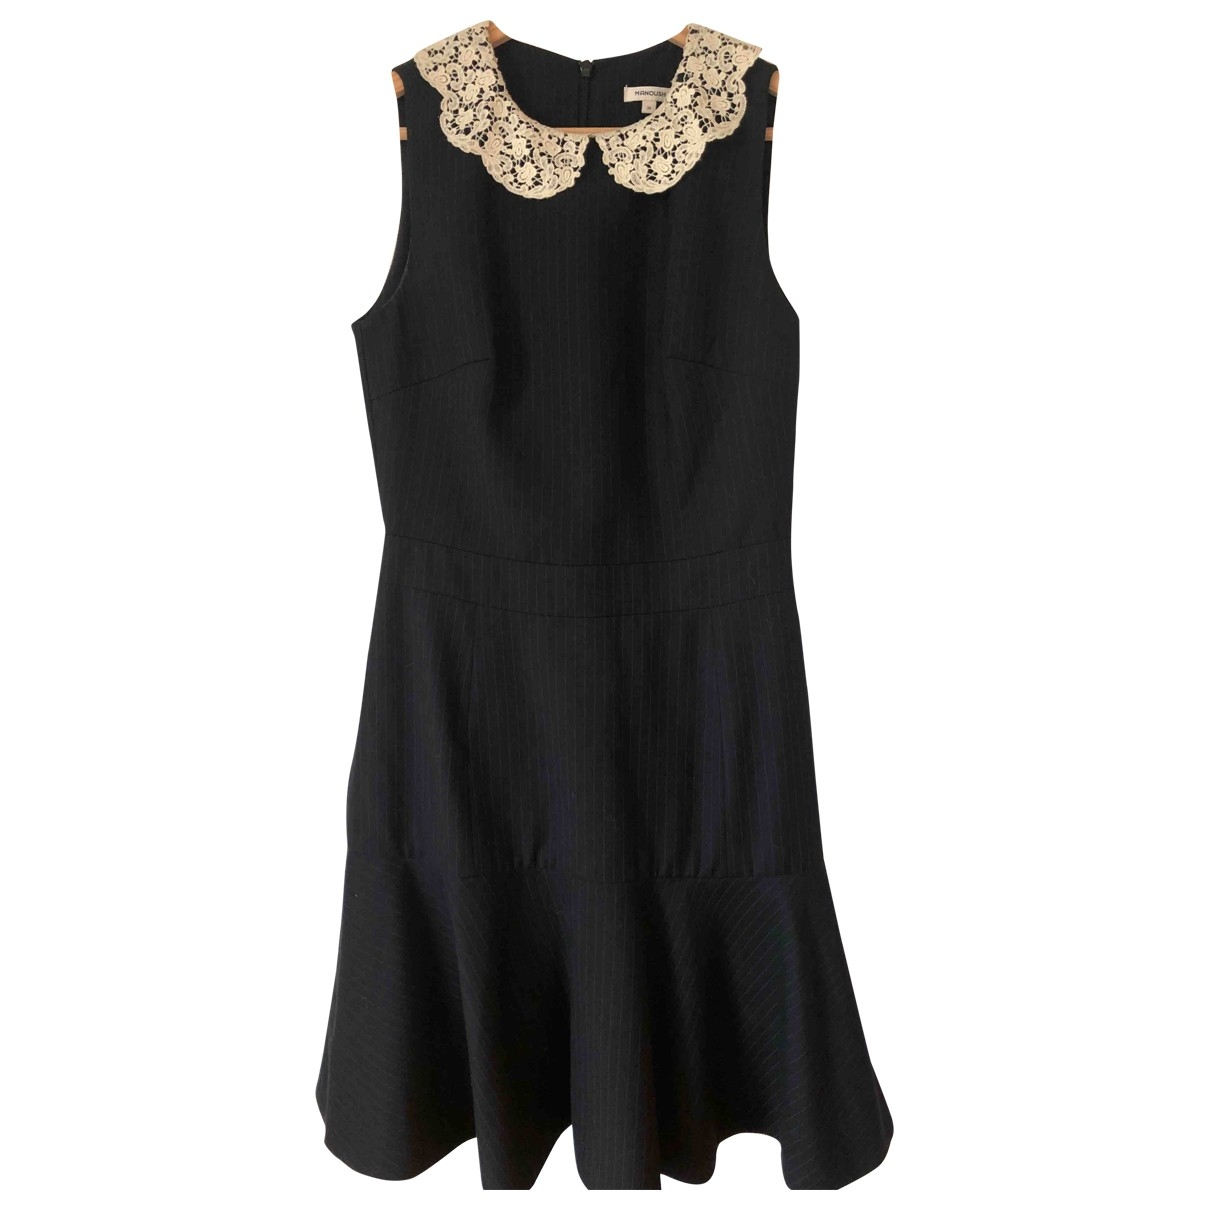 Manoush \N Kleid in  Anthrazit Synthetik